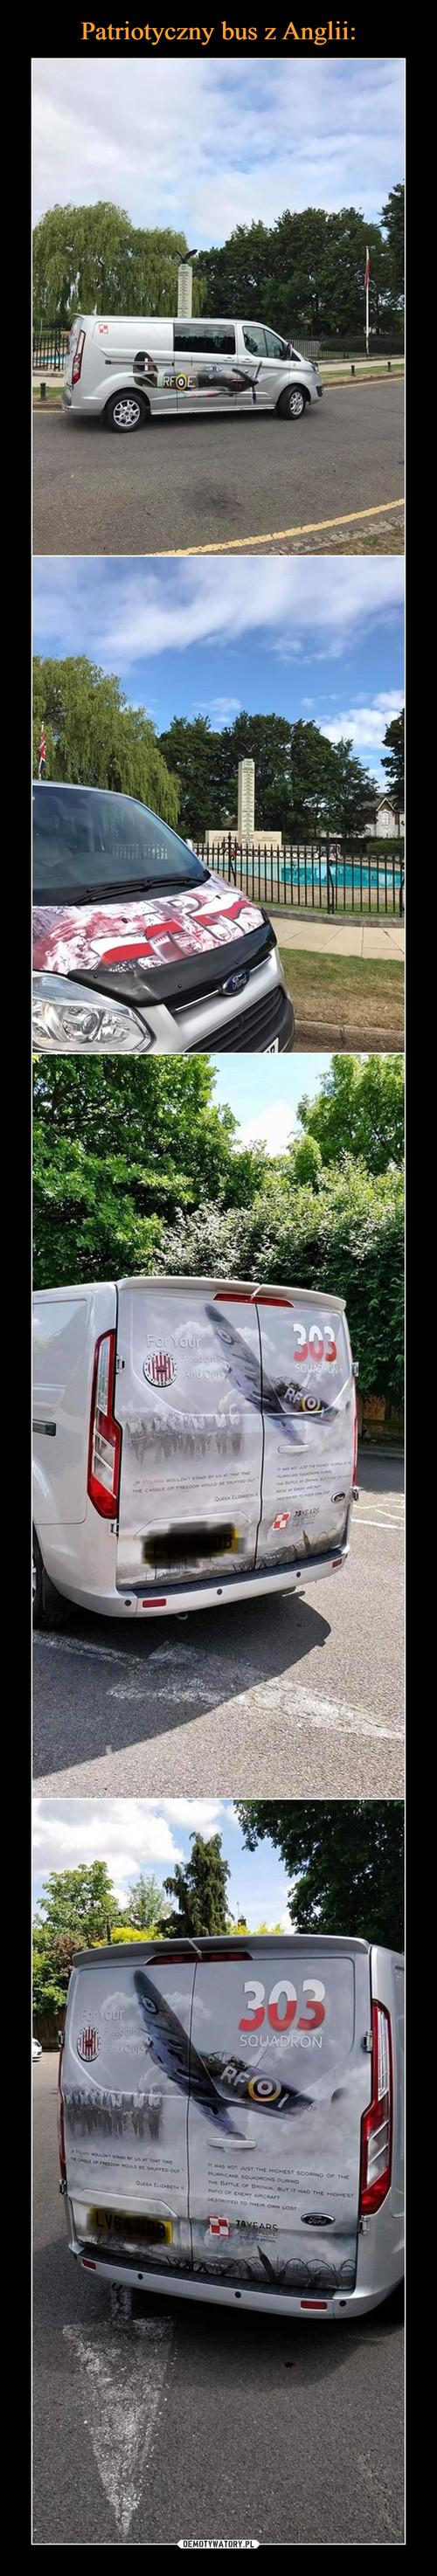 Patriotyczny bus z Anglii: